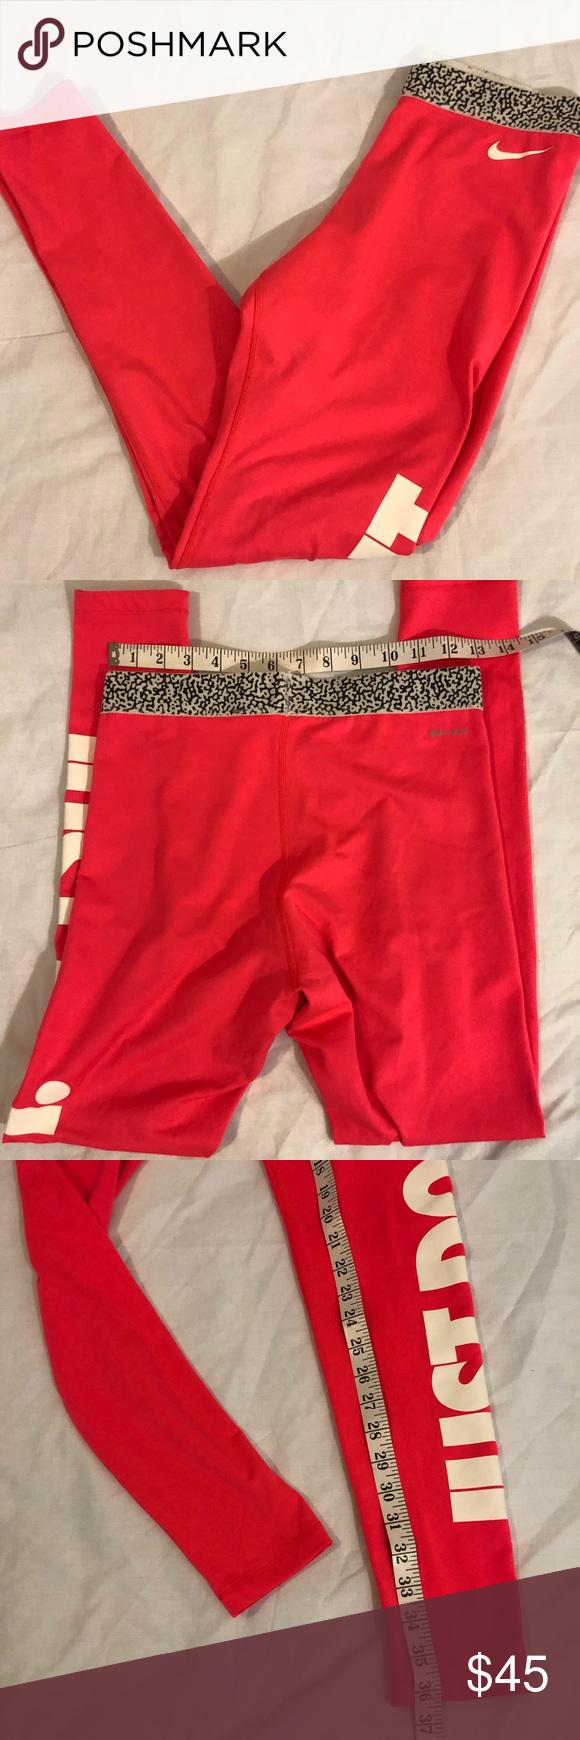 "Nike leggings ""just do it"" logo down leg small Nike"